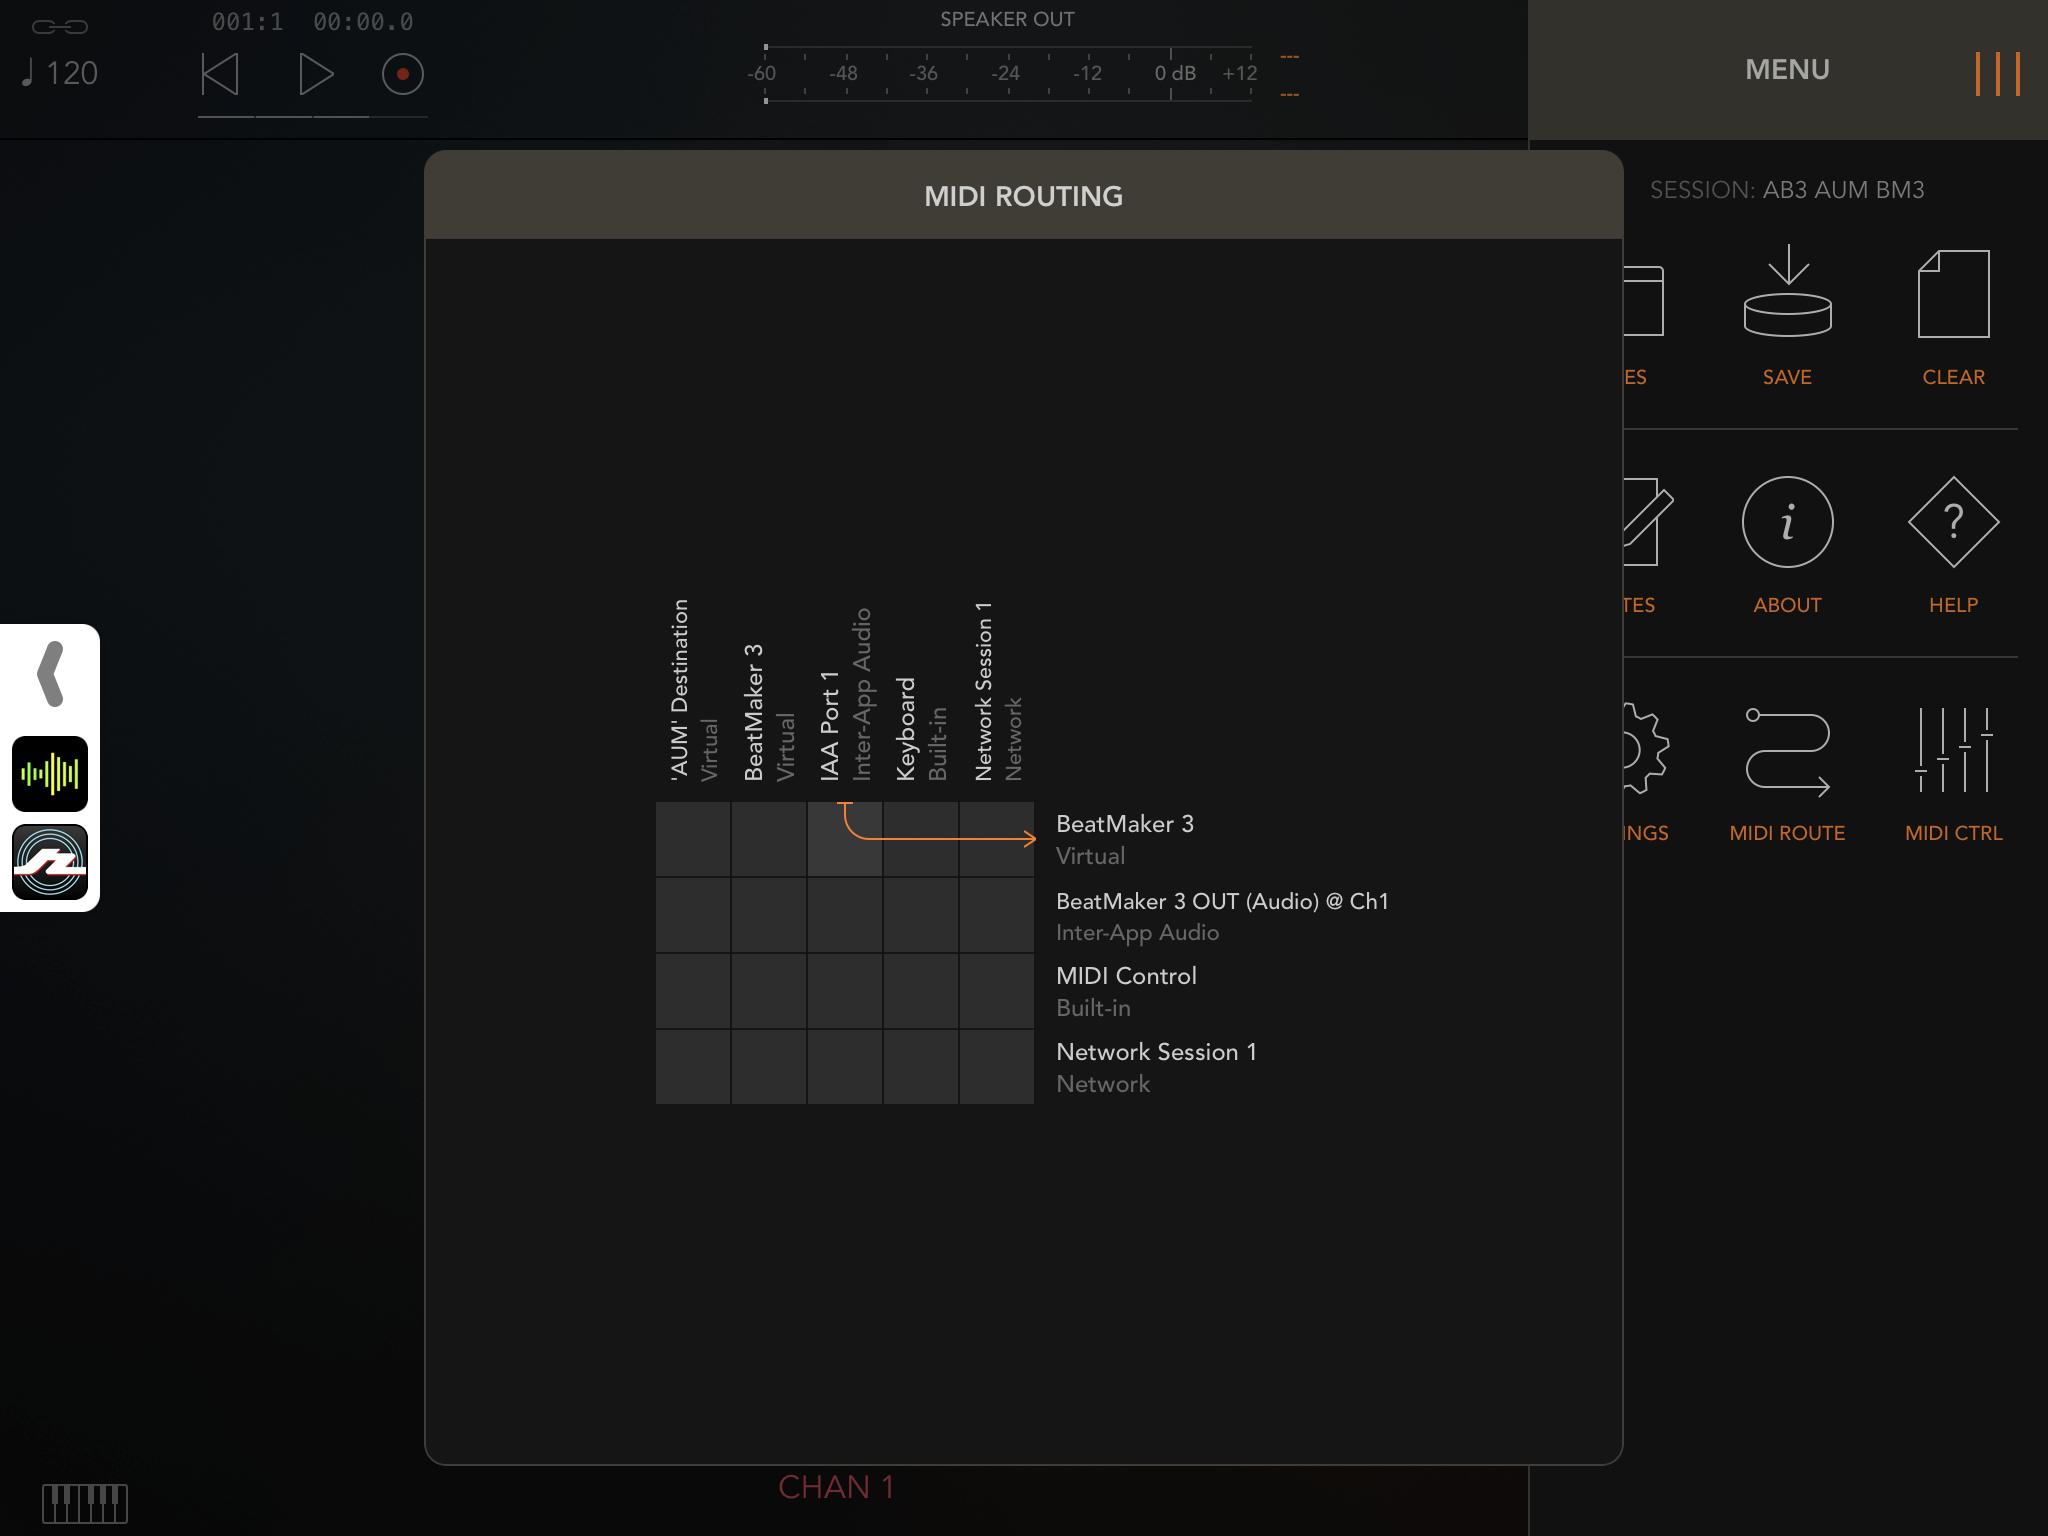 BeatMaker 3 receiving MIDI or Audio within AudioBus